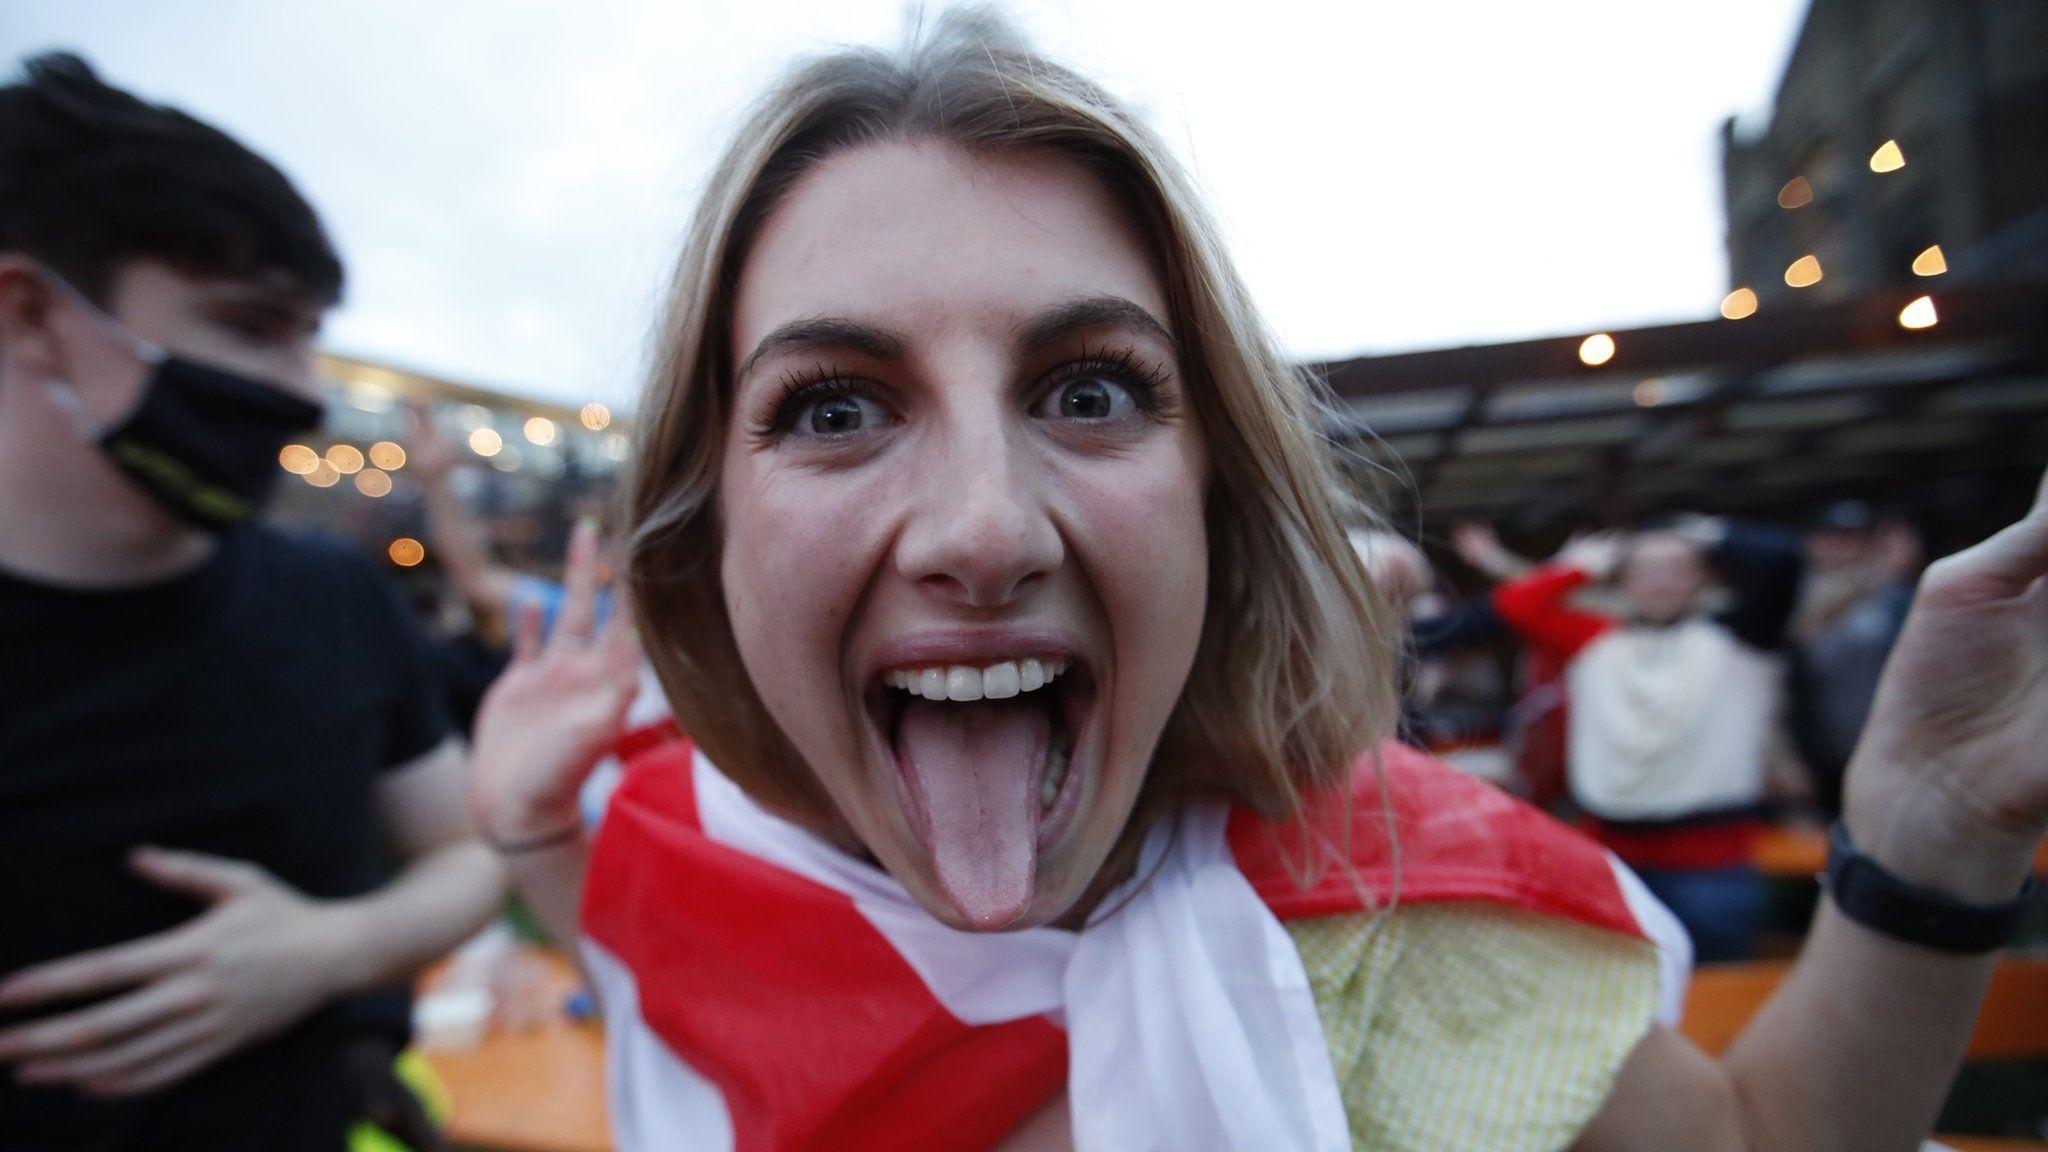 A fan celebrates at the Vinegar Yard in south east London